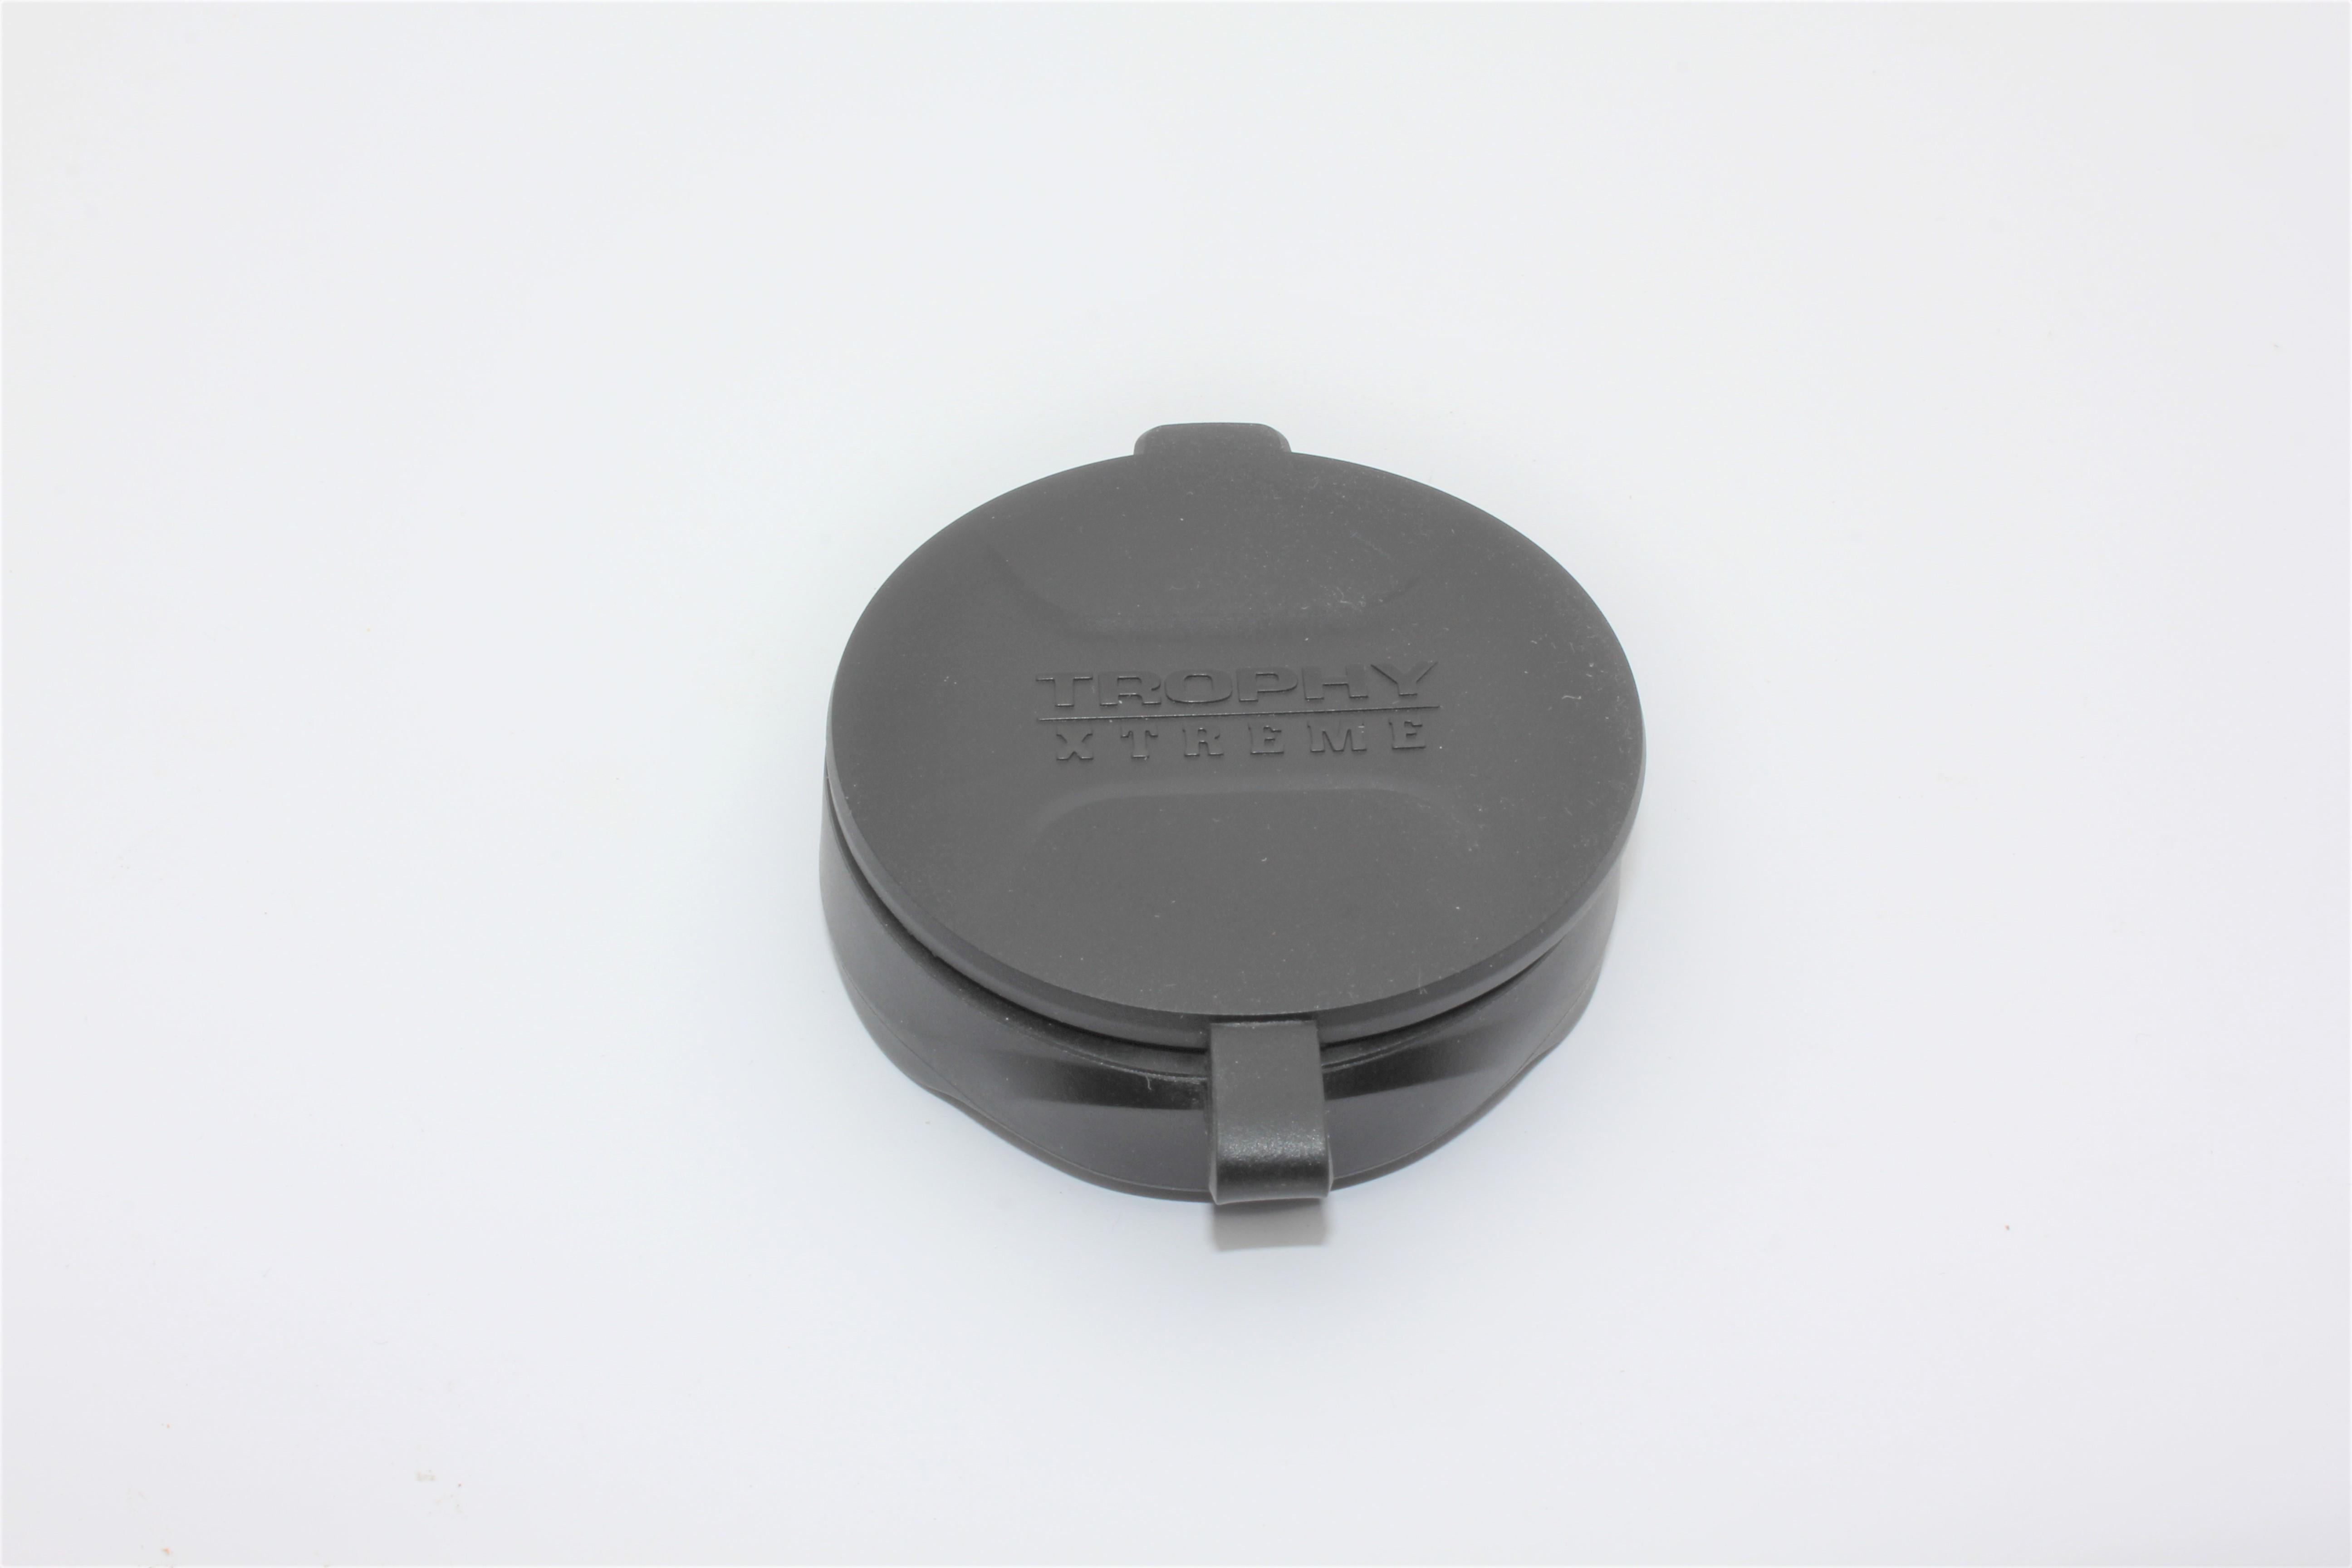 Objective Lens Cap for Bushnell Trophy 8x42 #334211 #334210 10x42 #34211 #334210 (Single)